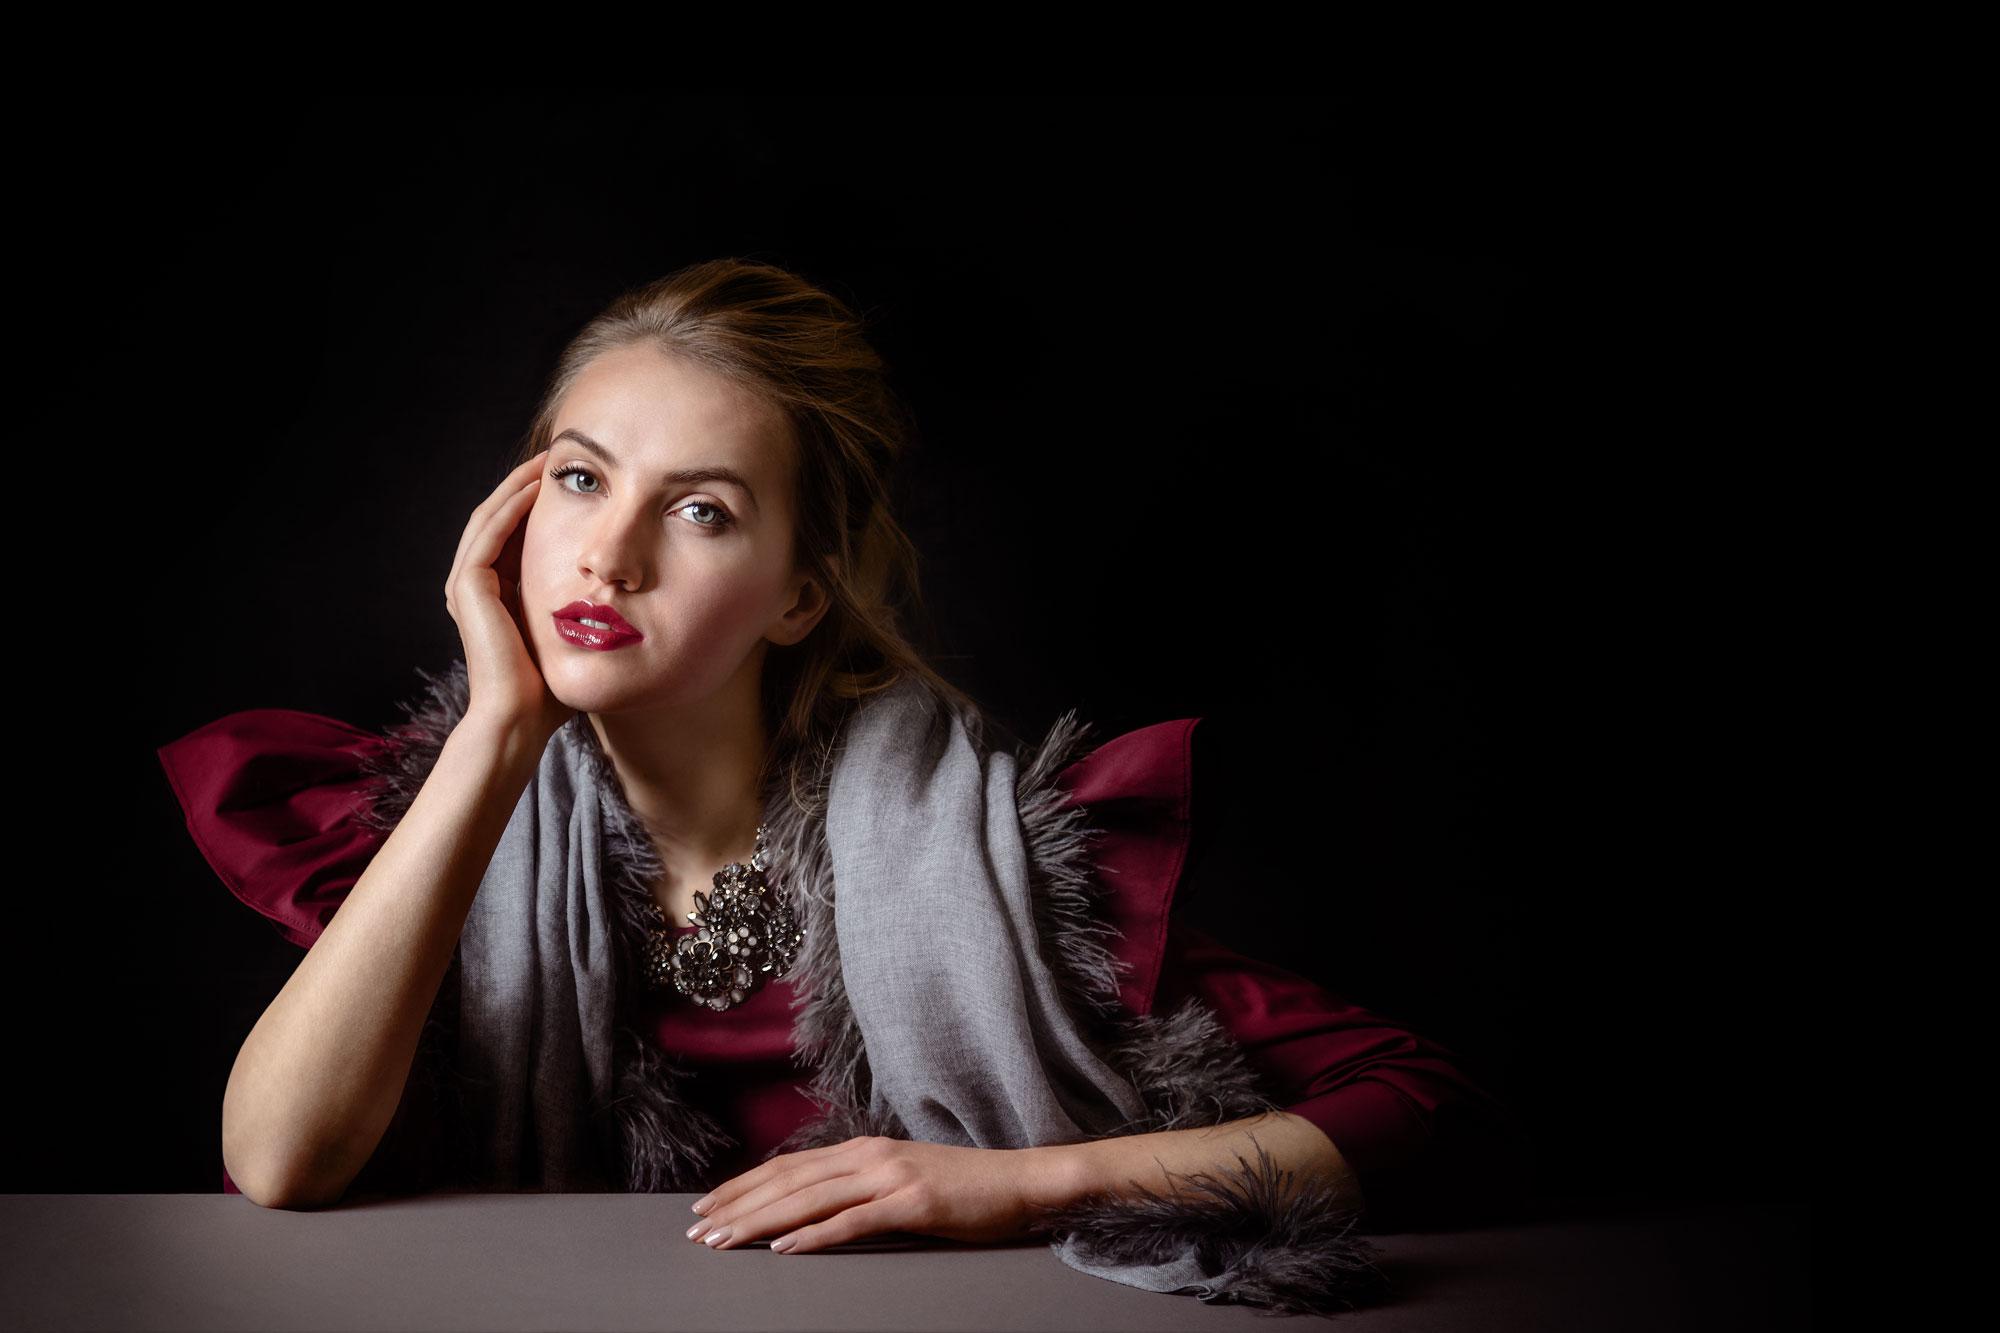 SHOT_FOTOGRAFIE_Katja_Schubert_munich_fashion_feneun_hw17_11